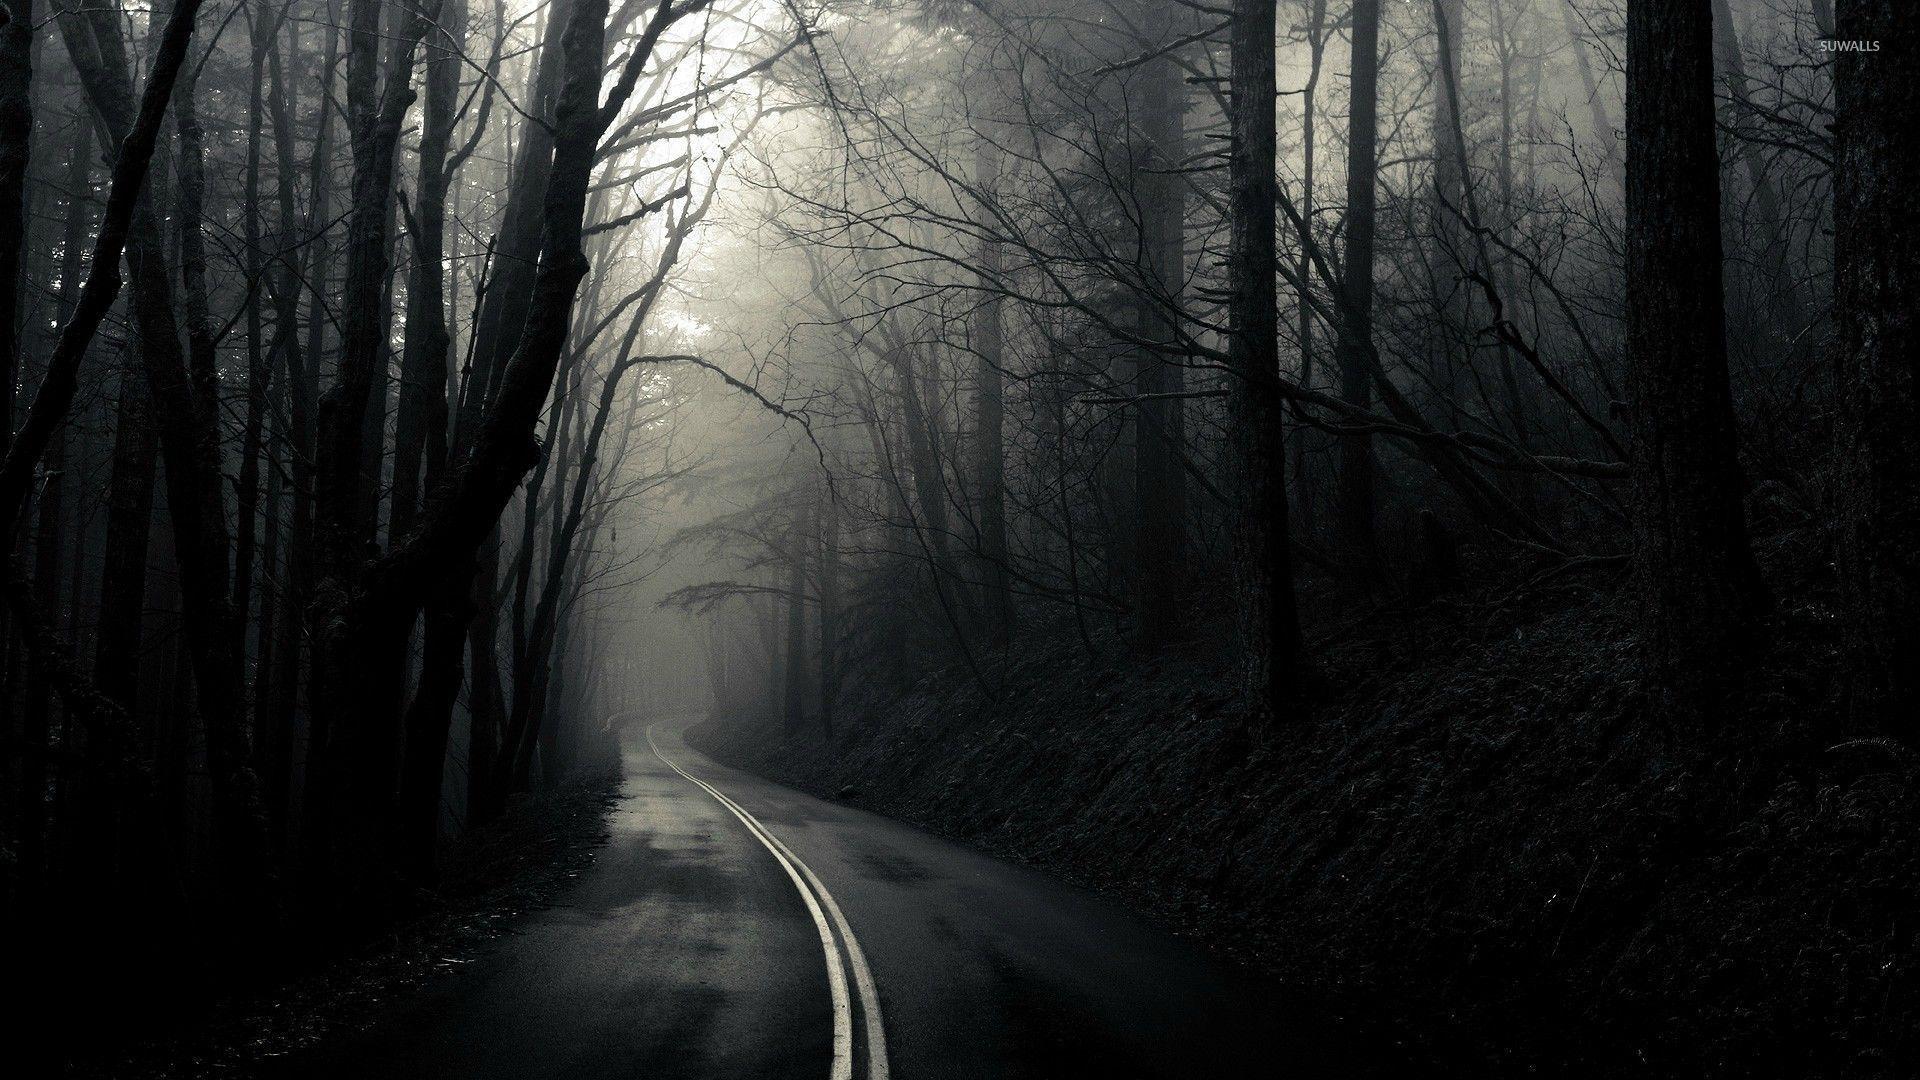 Road Through The Dark Woods Wallpaper